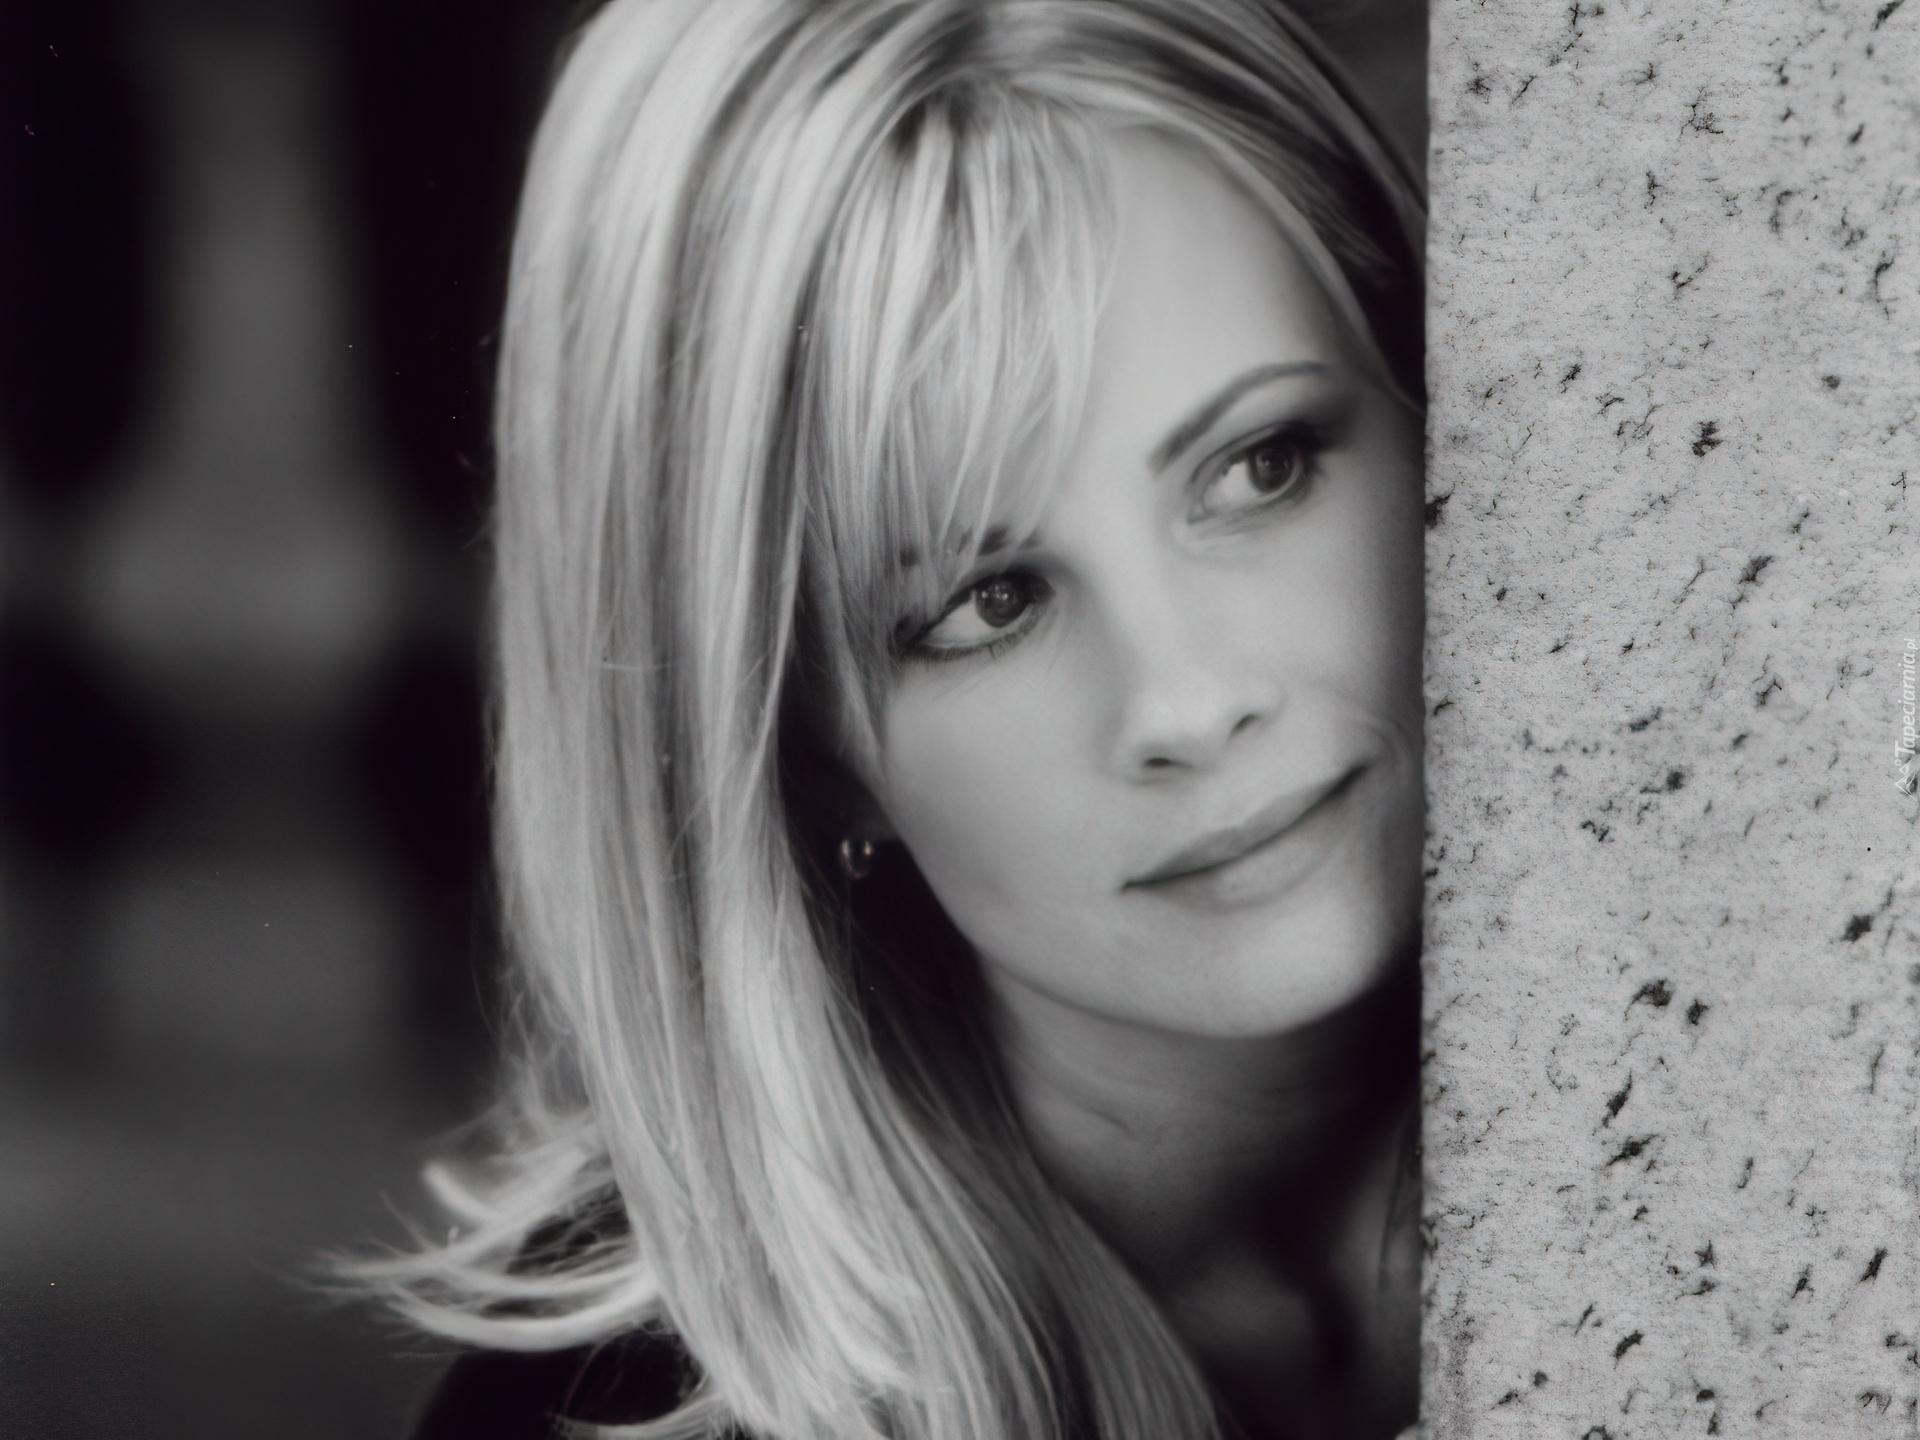 new-actress-monica-potter-naked-naked